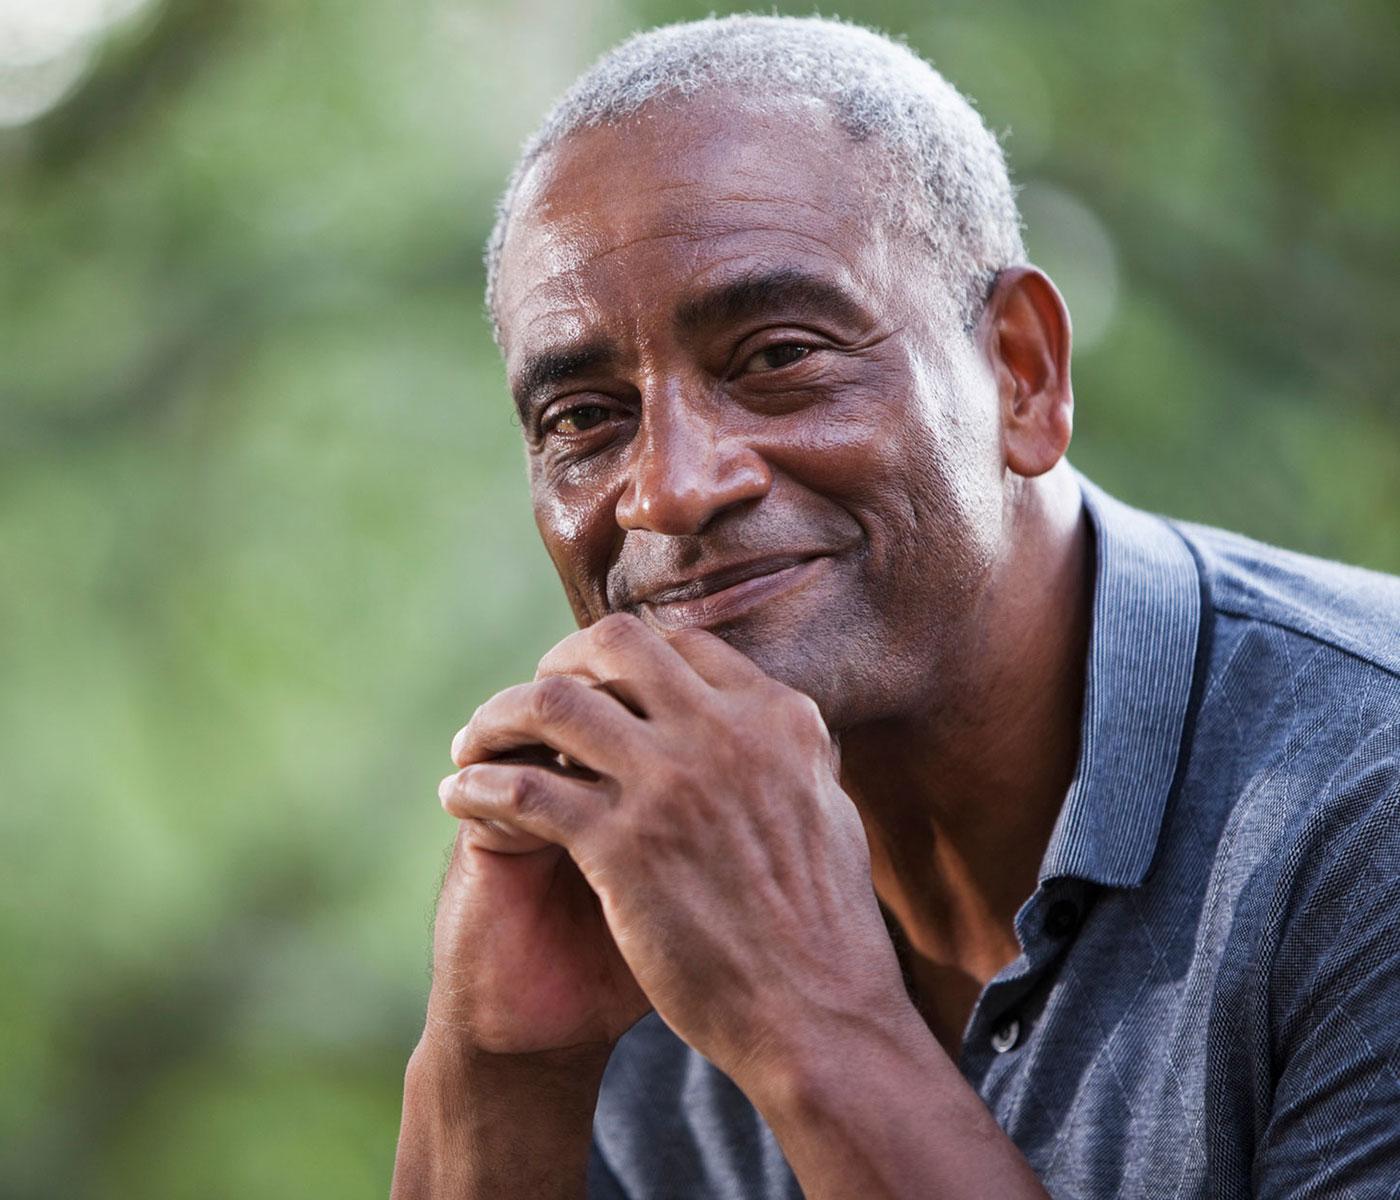 Older Black Man Smiling at Camera